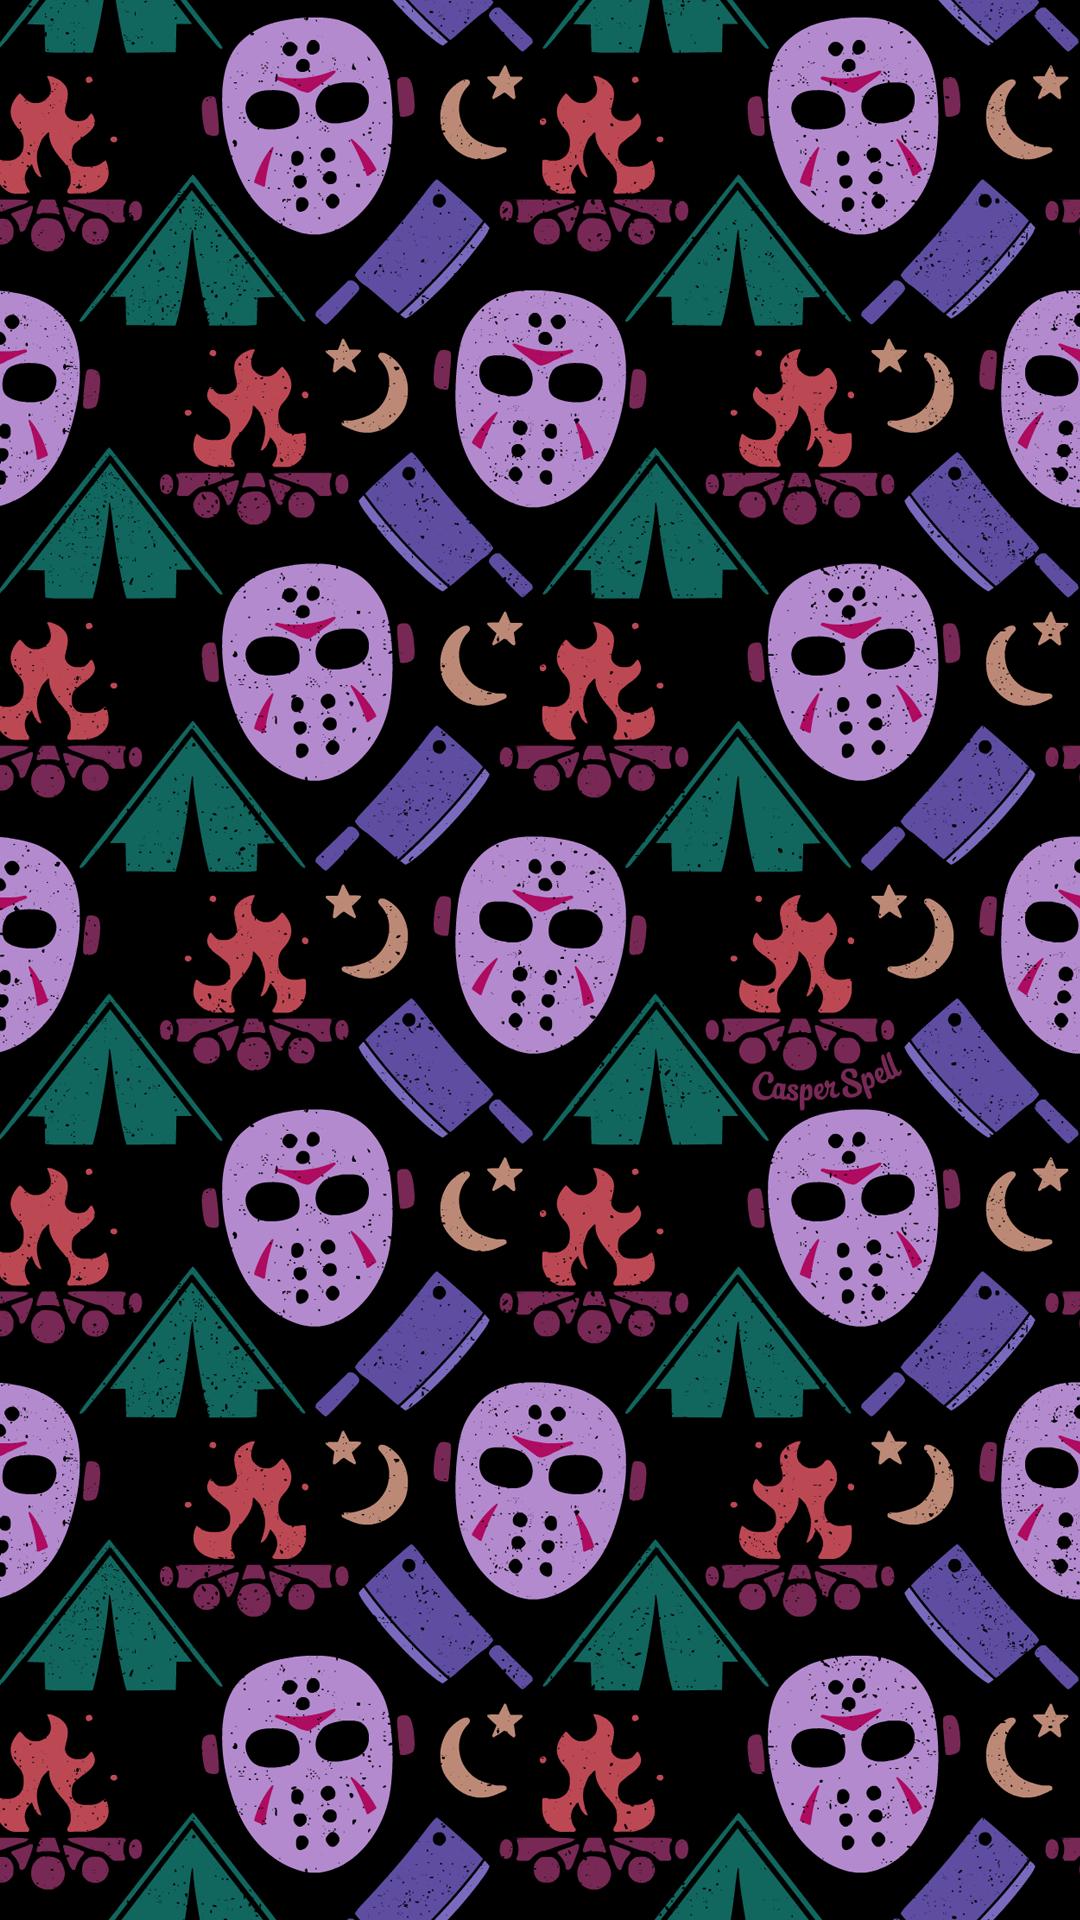 Casper Spell — casperspell's shop on Spoonflower fabric